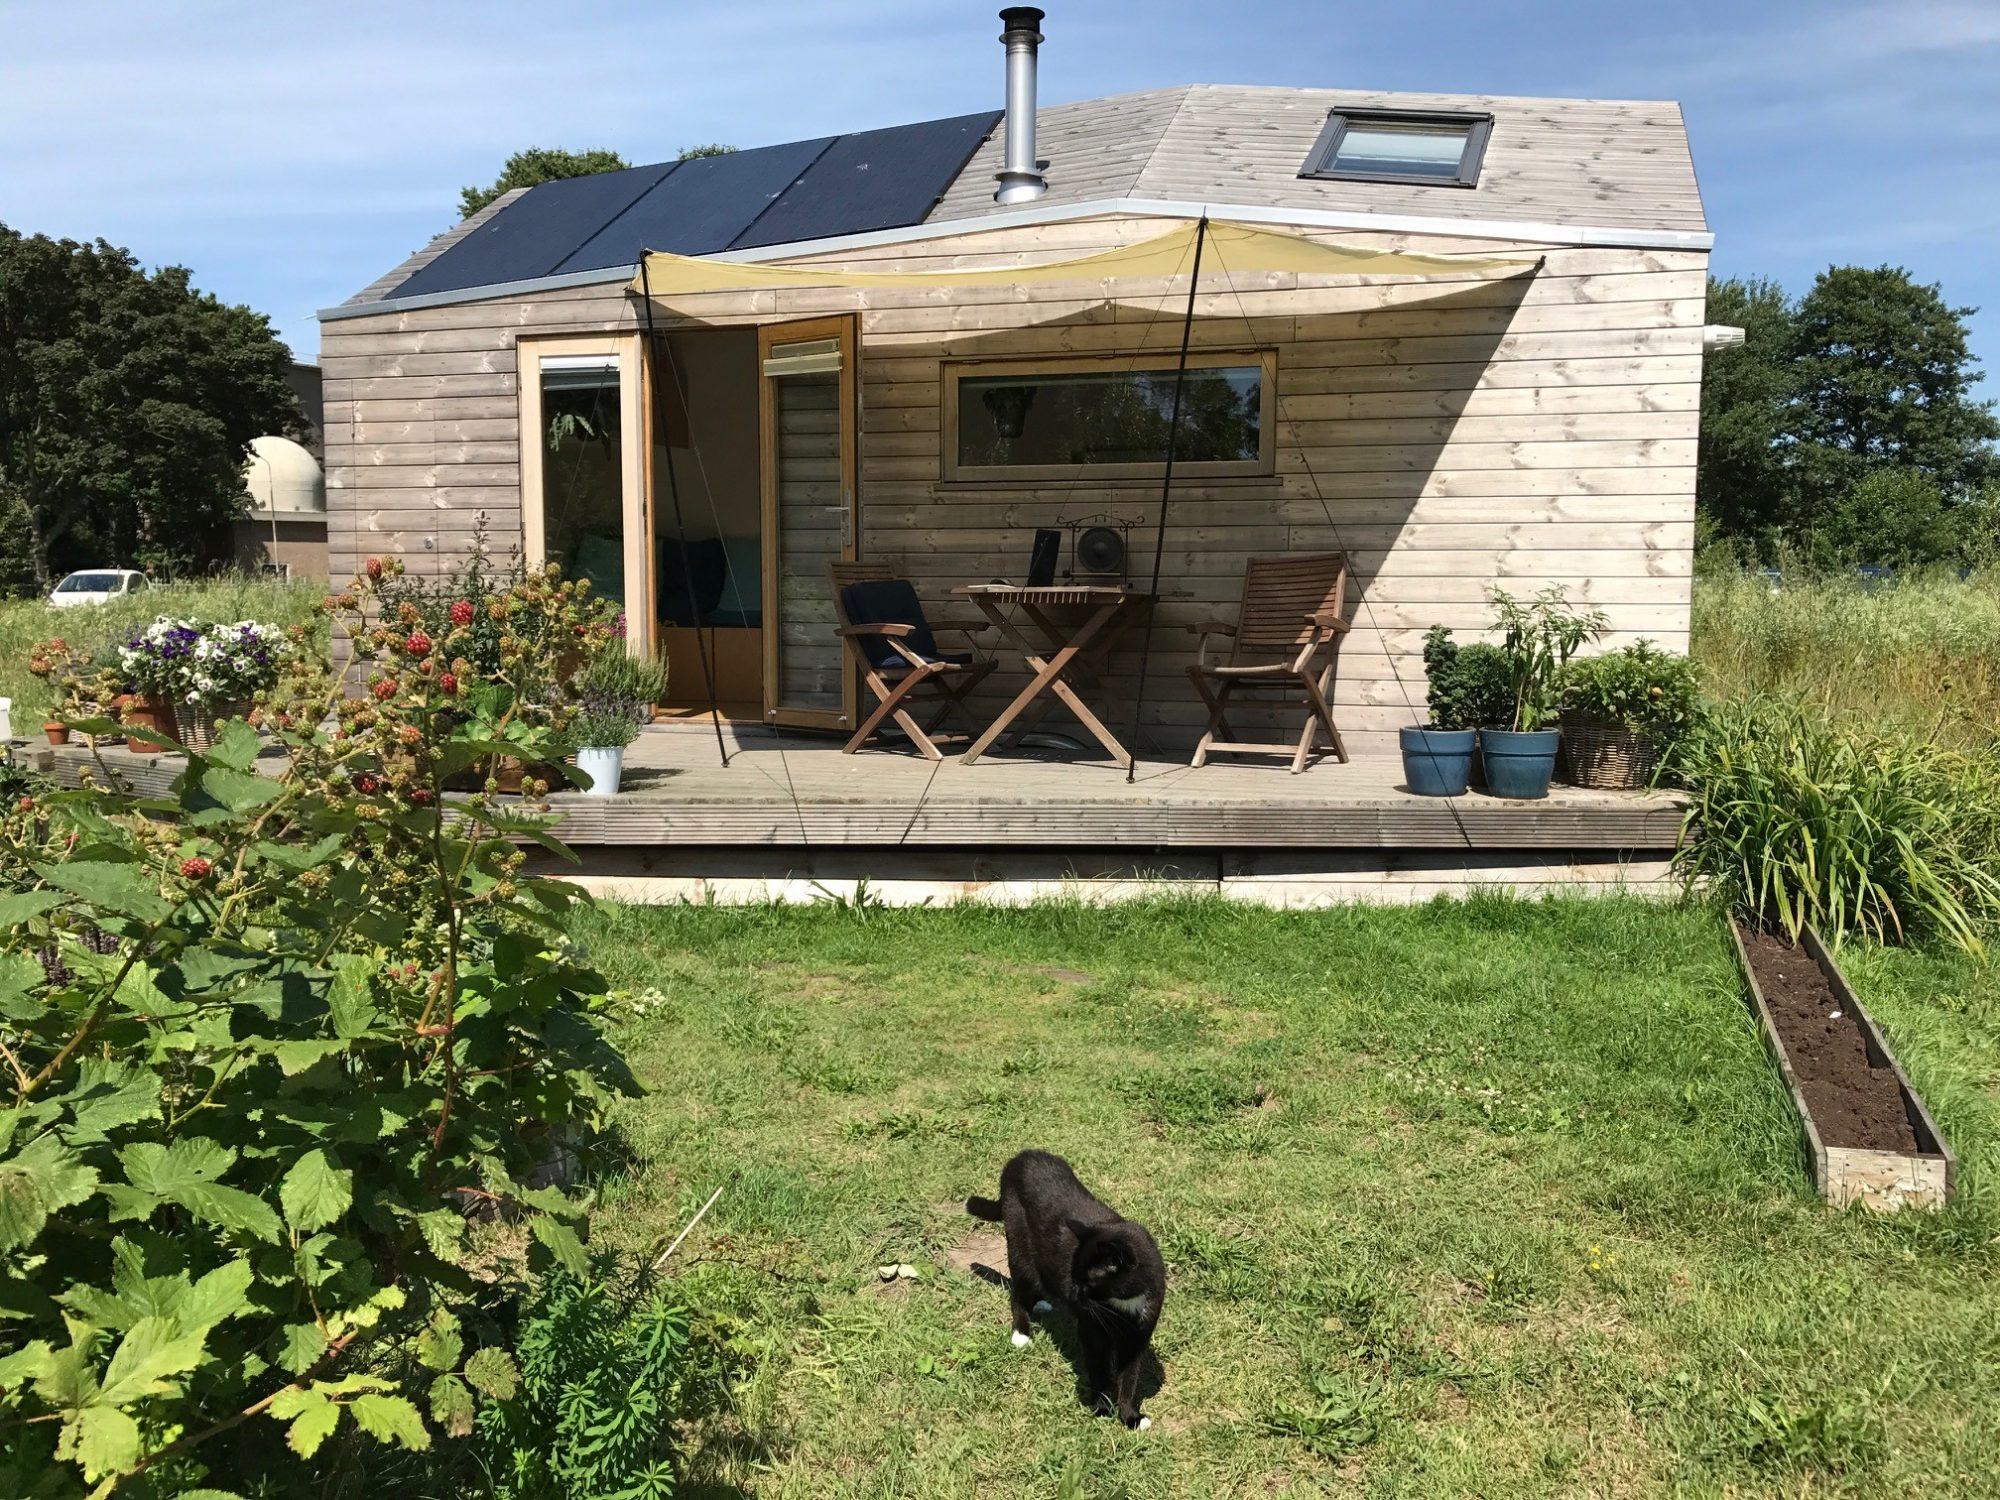 off grid solar in a tiny house u2013 marjolein in het klein